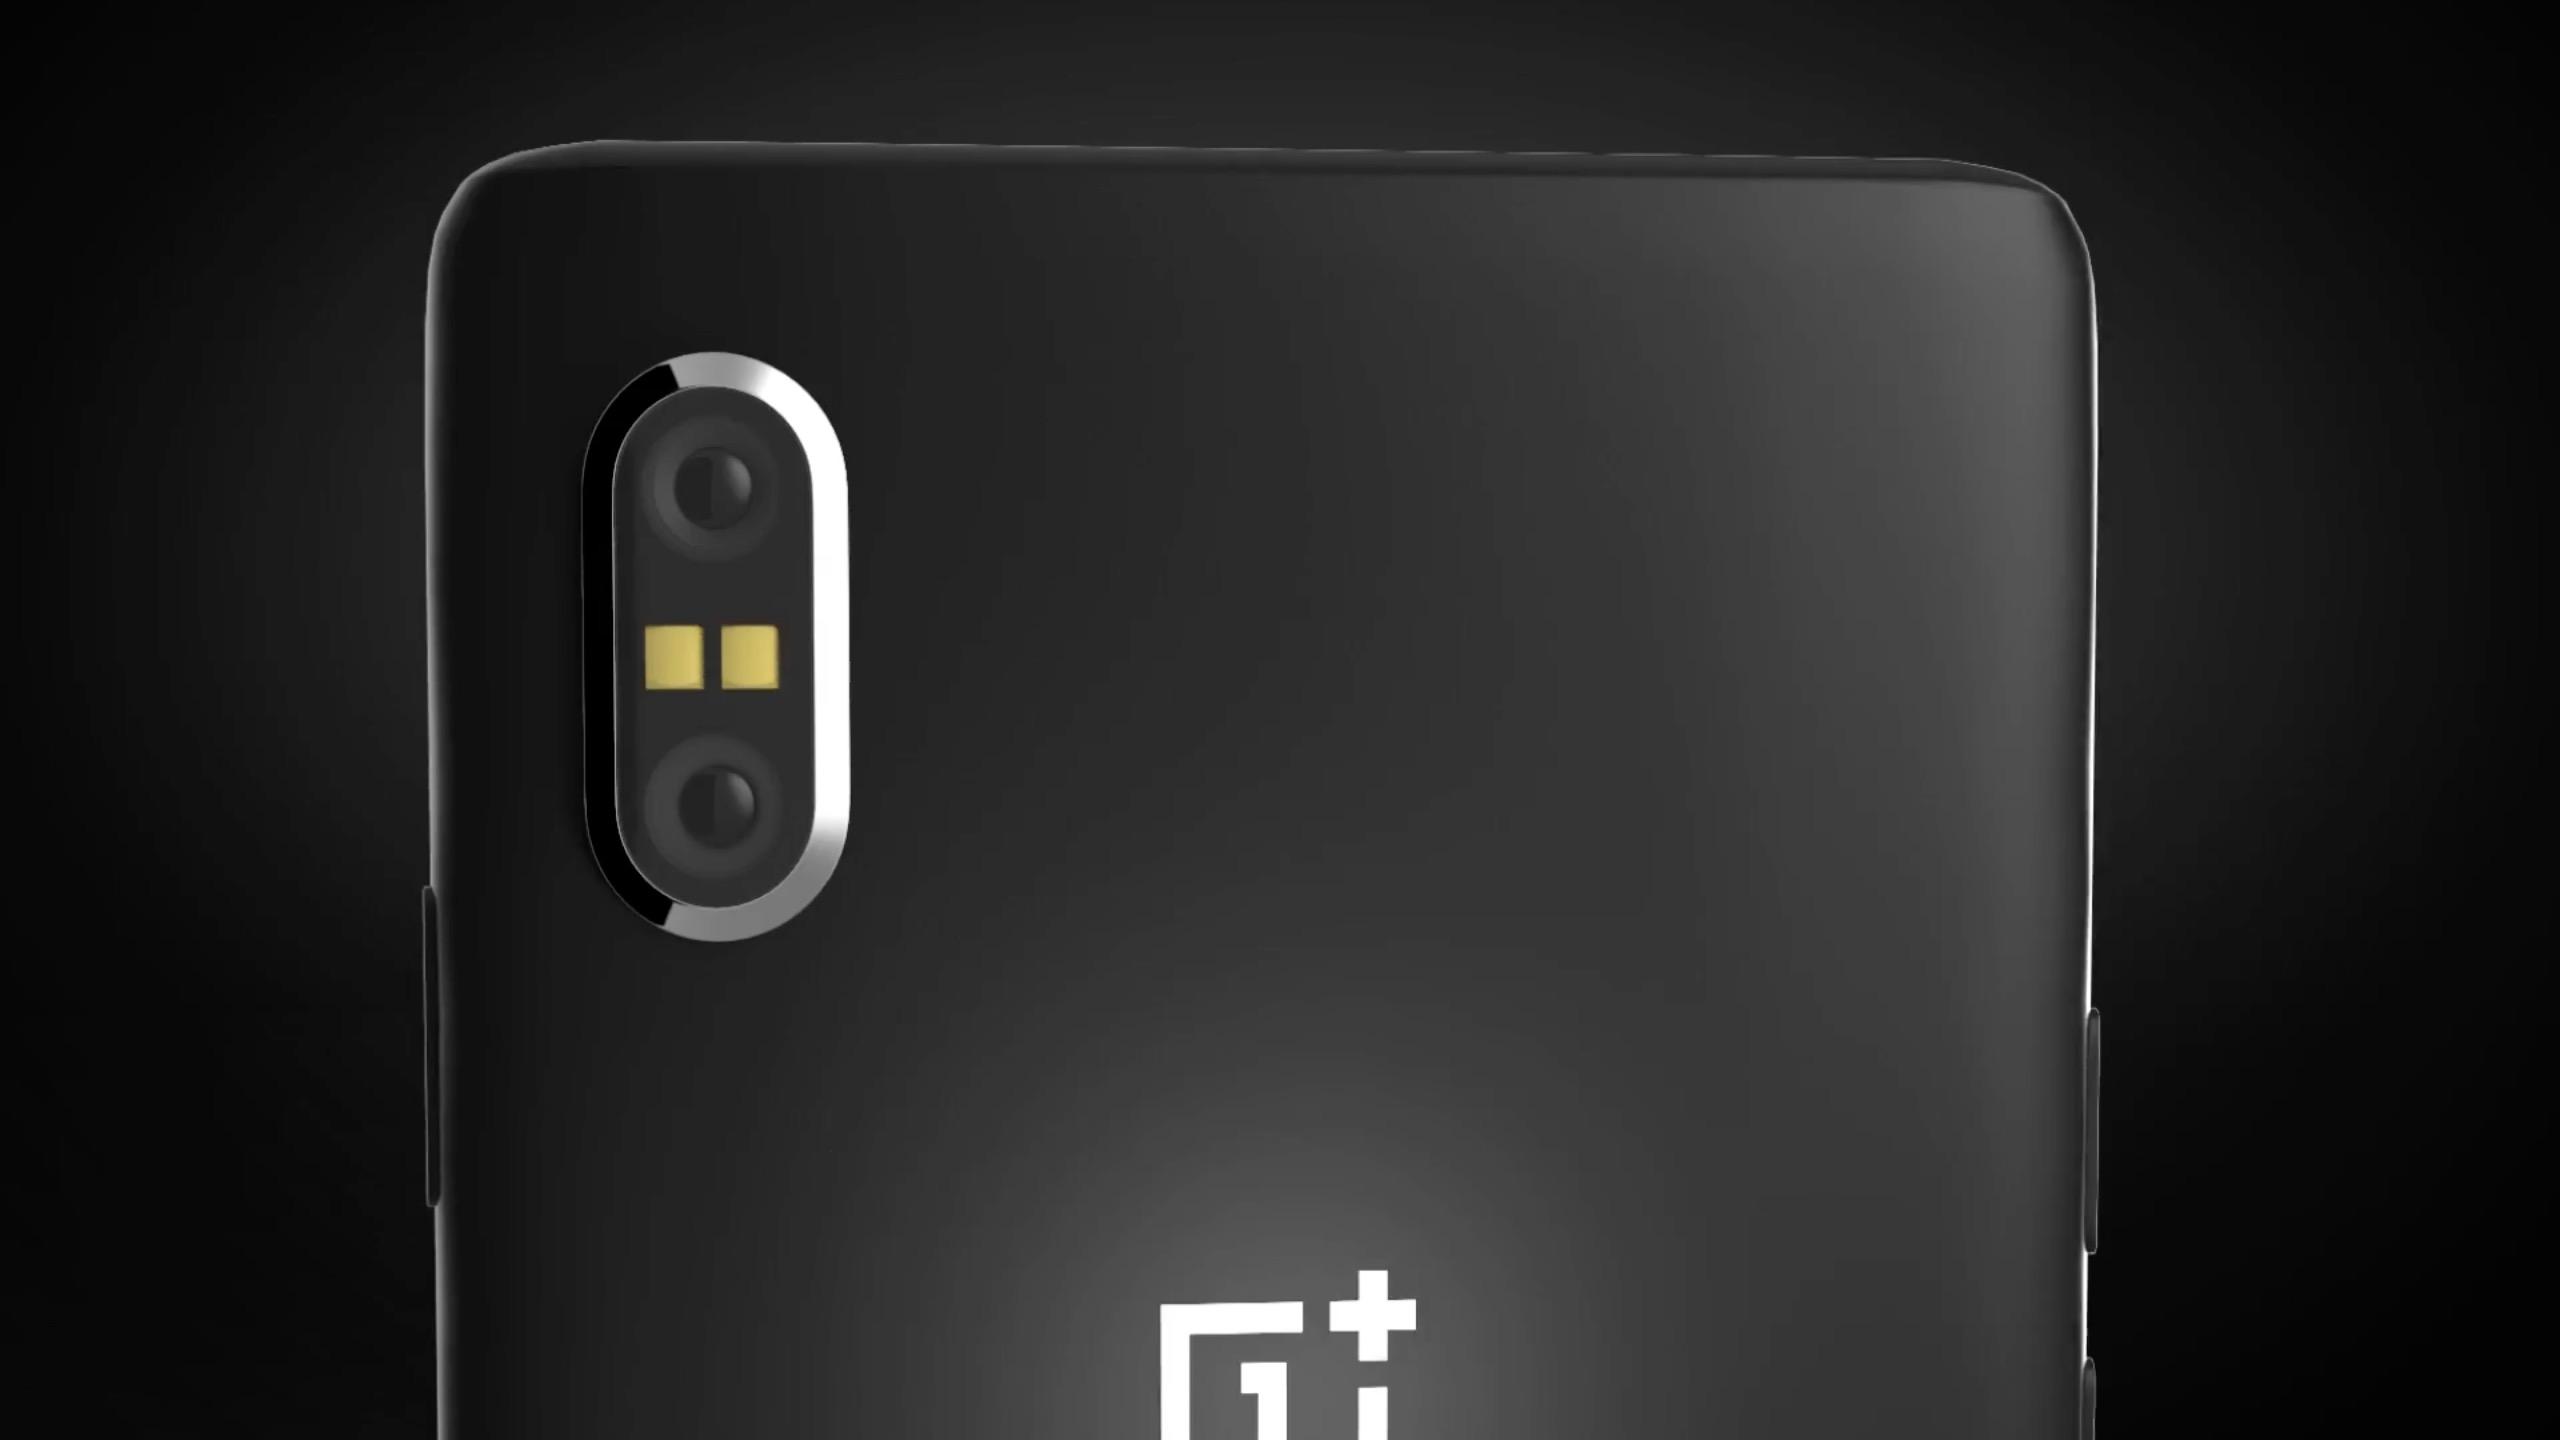 OnePlus 6. Έρχεται το Μάρτιο με αισθητήρα δακτυλικών ...